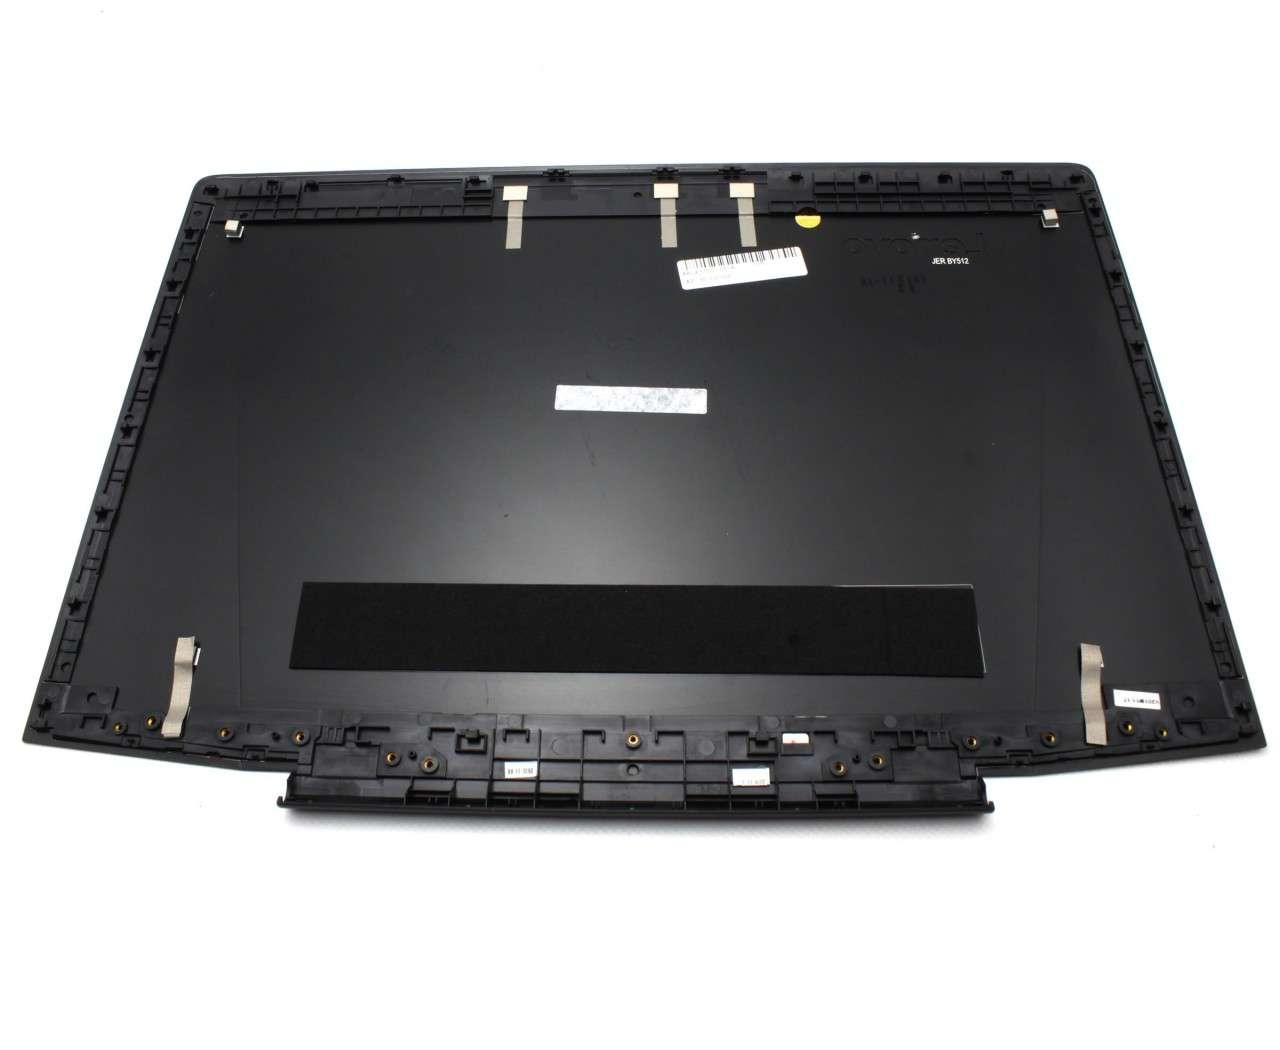 Capac Display BackCover Lenovo IdeaPad Y700-15ISK Carcasa Display cu Versiune Camera 3D imagine powerlaptop.ro 2021